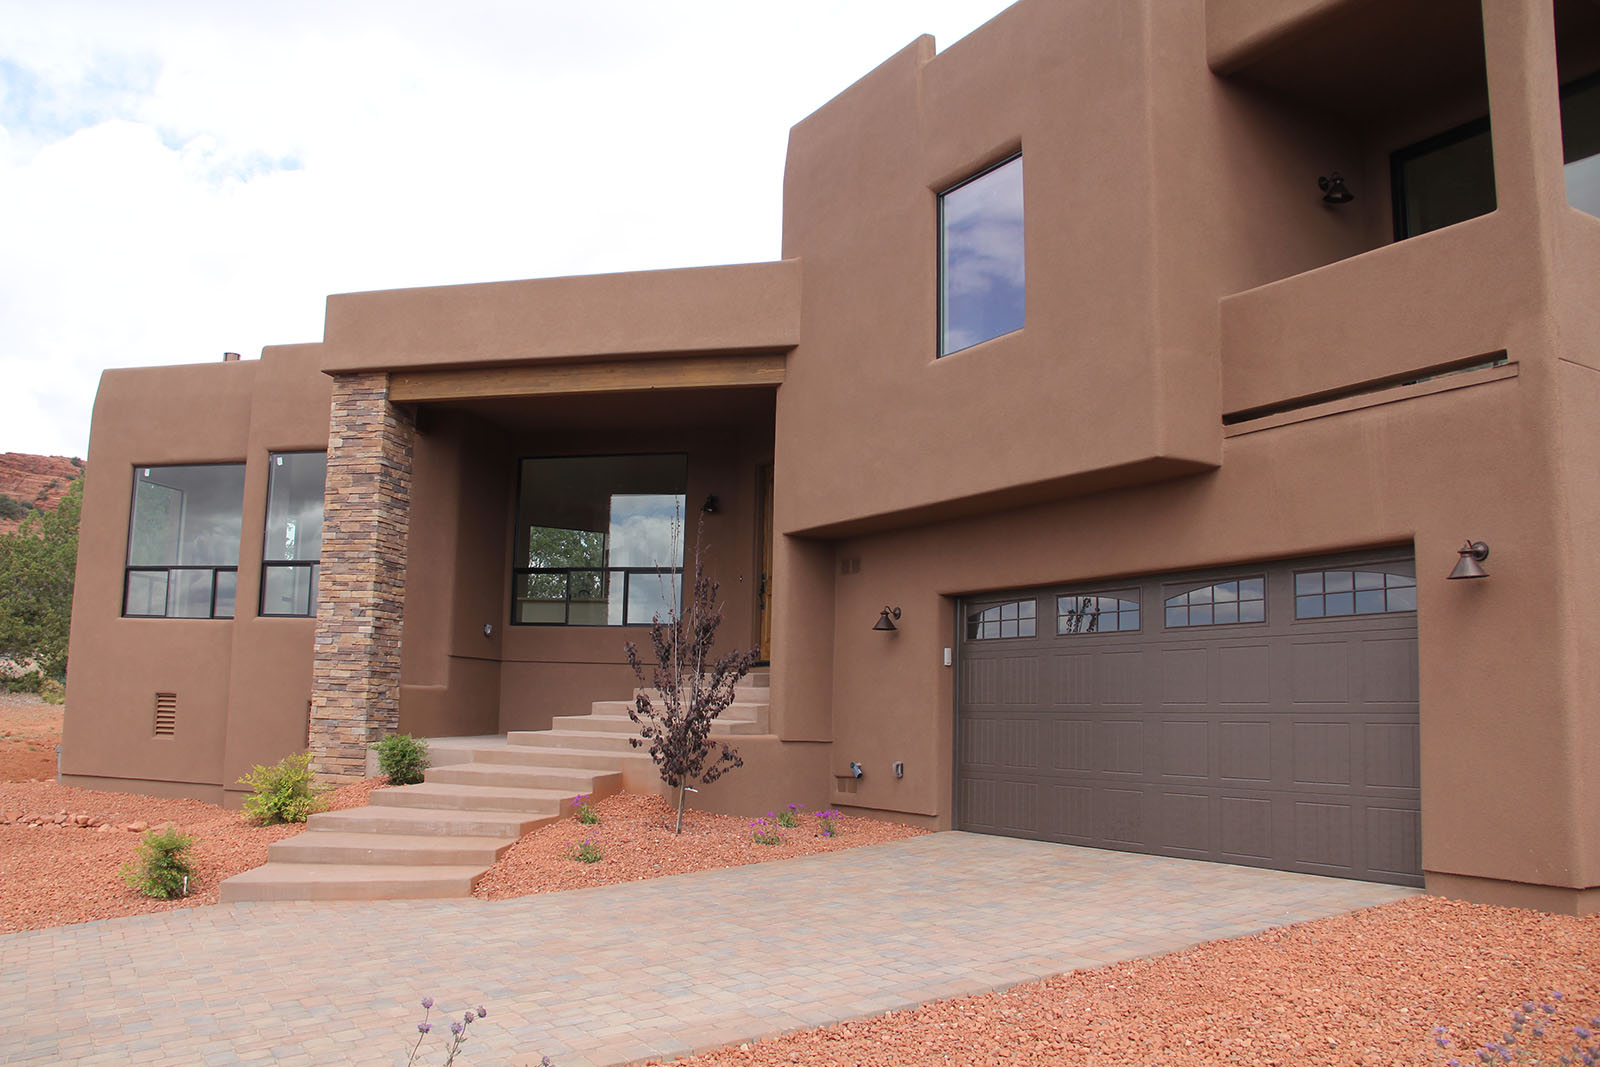 530-windsong-torel-custom-homes-sedona-arizona-0180-jpg